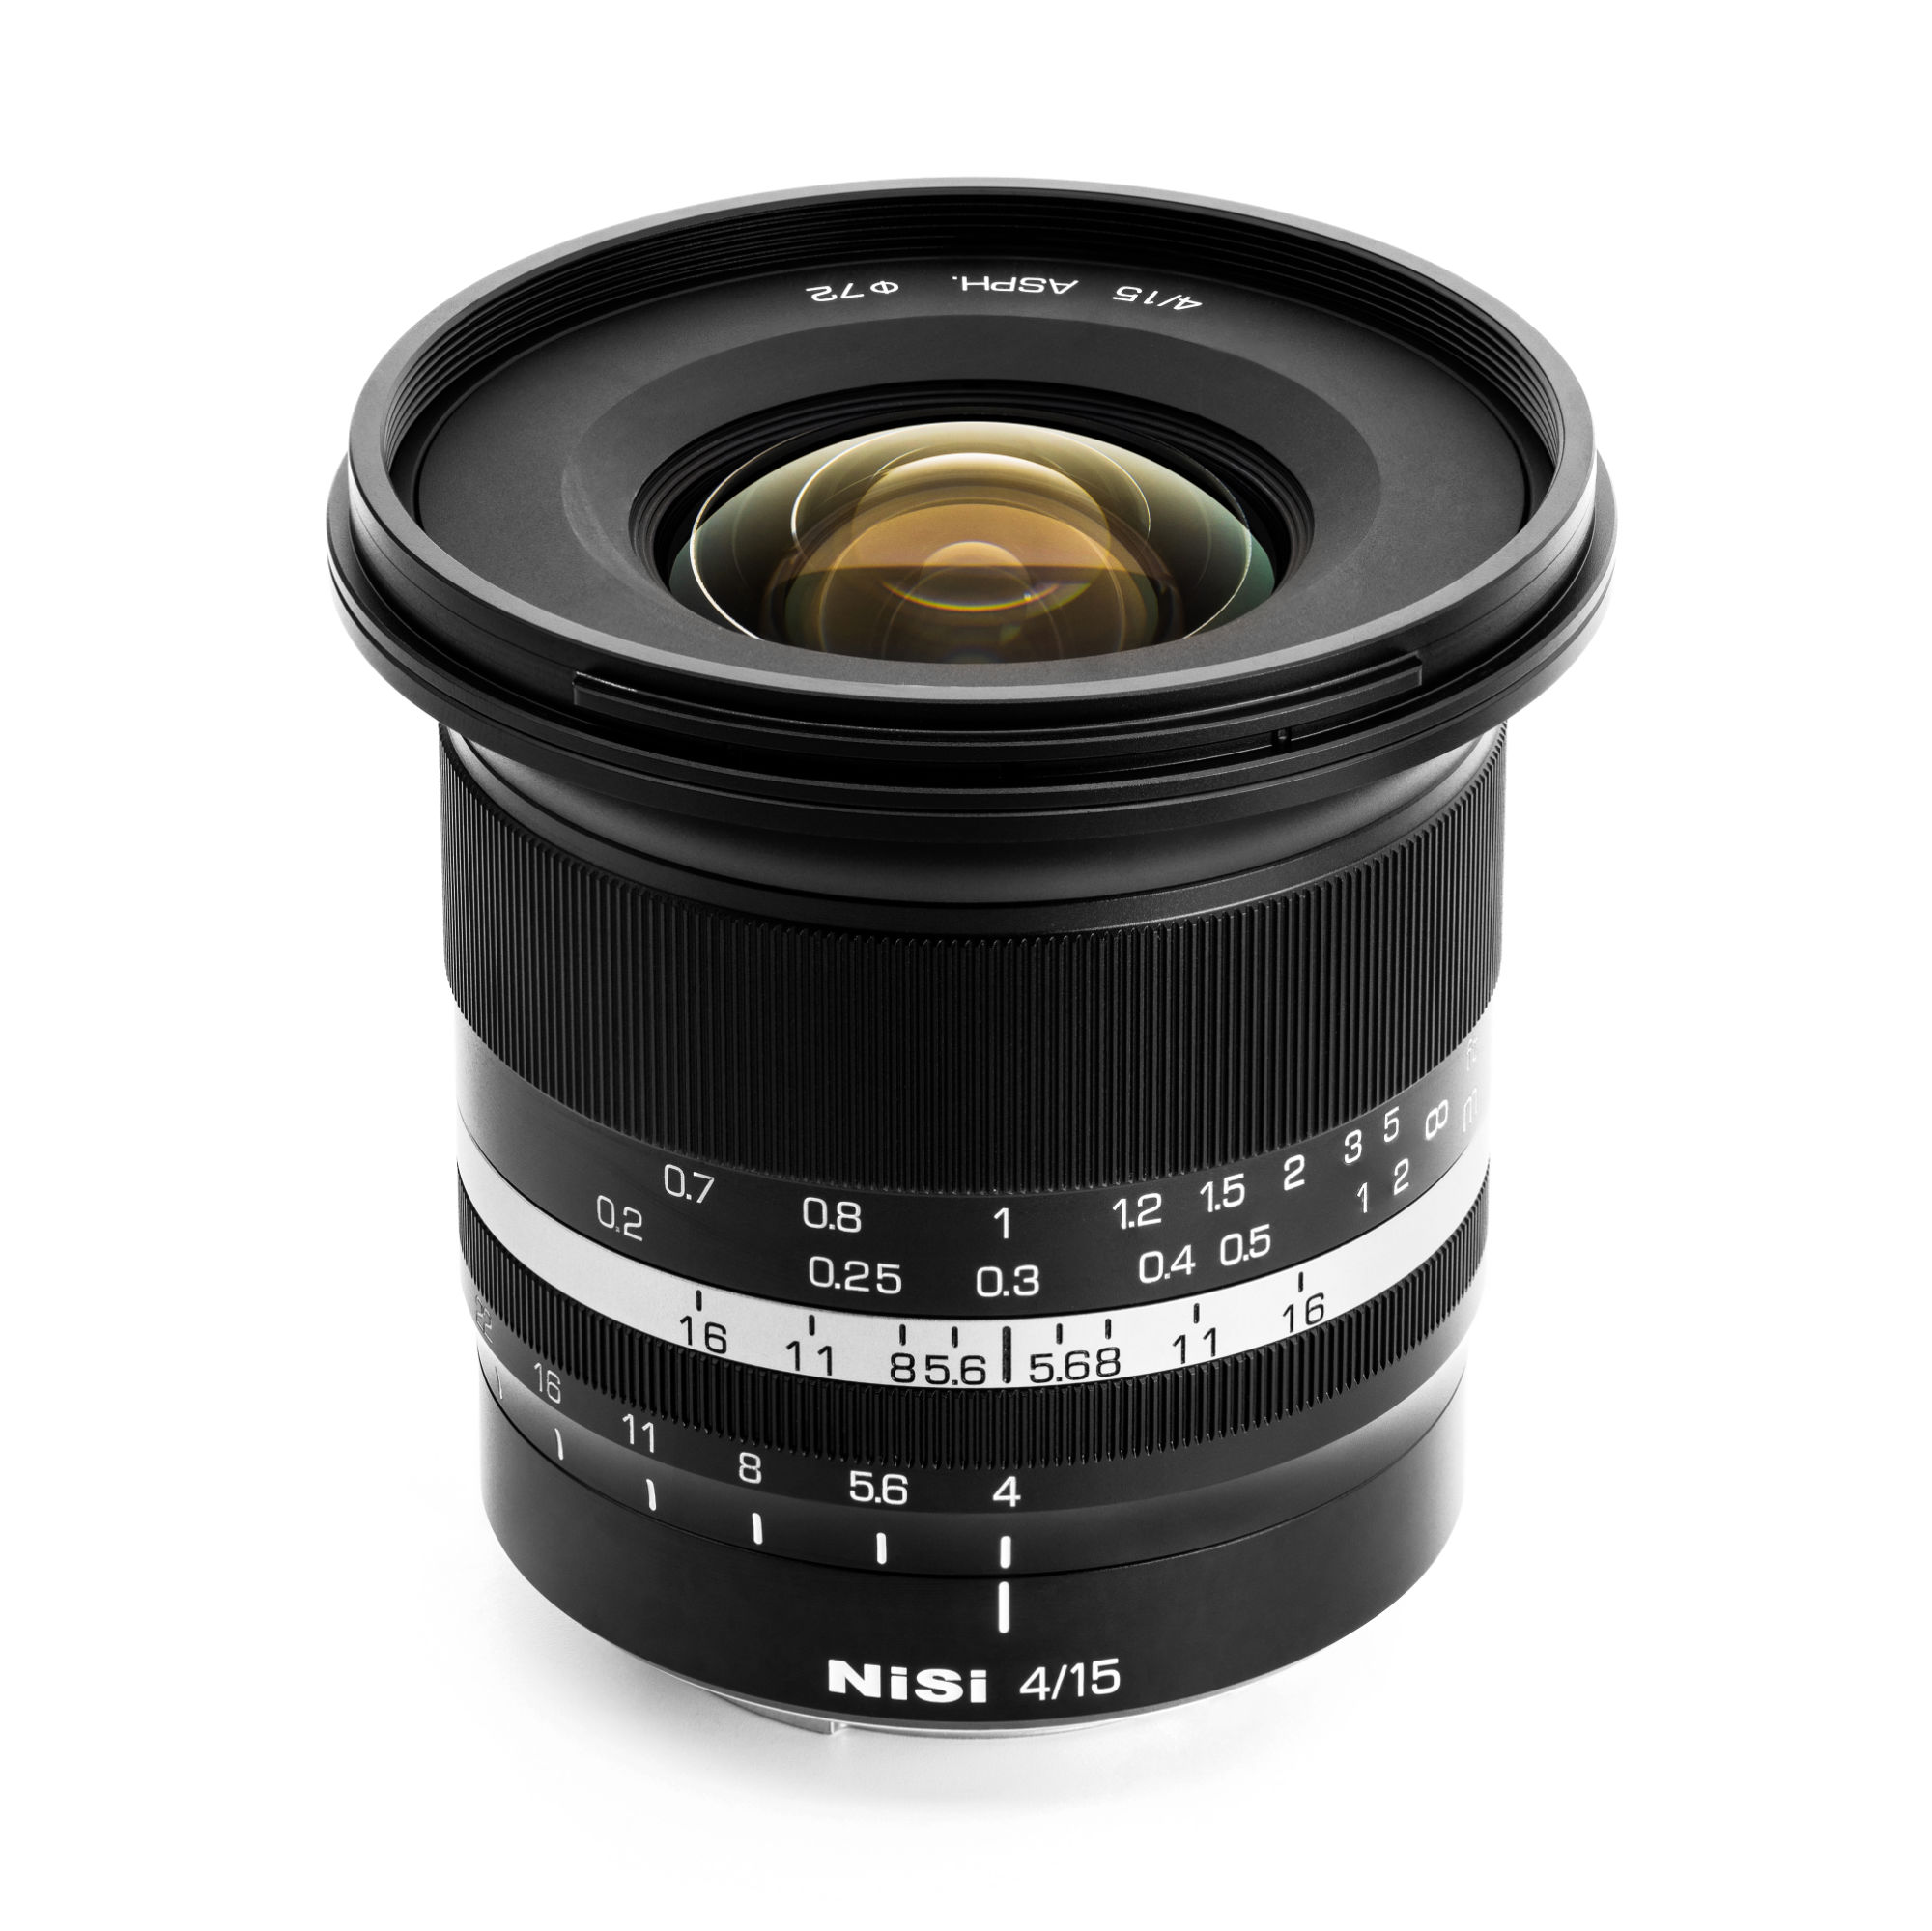 Leica L Mount